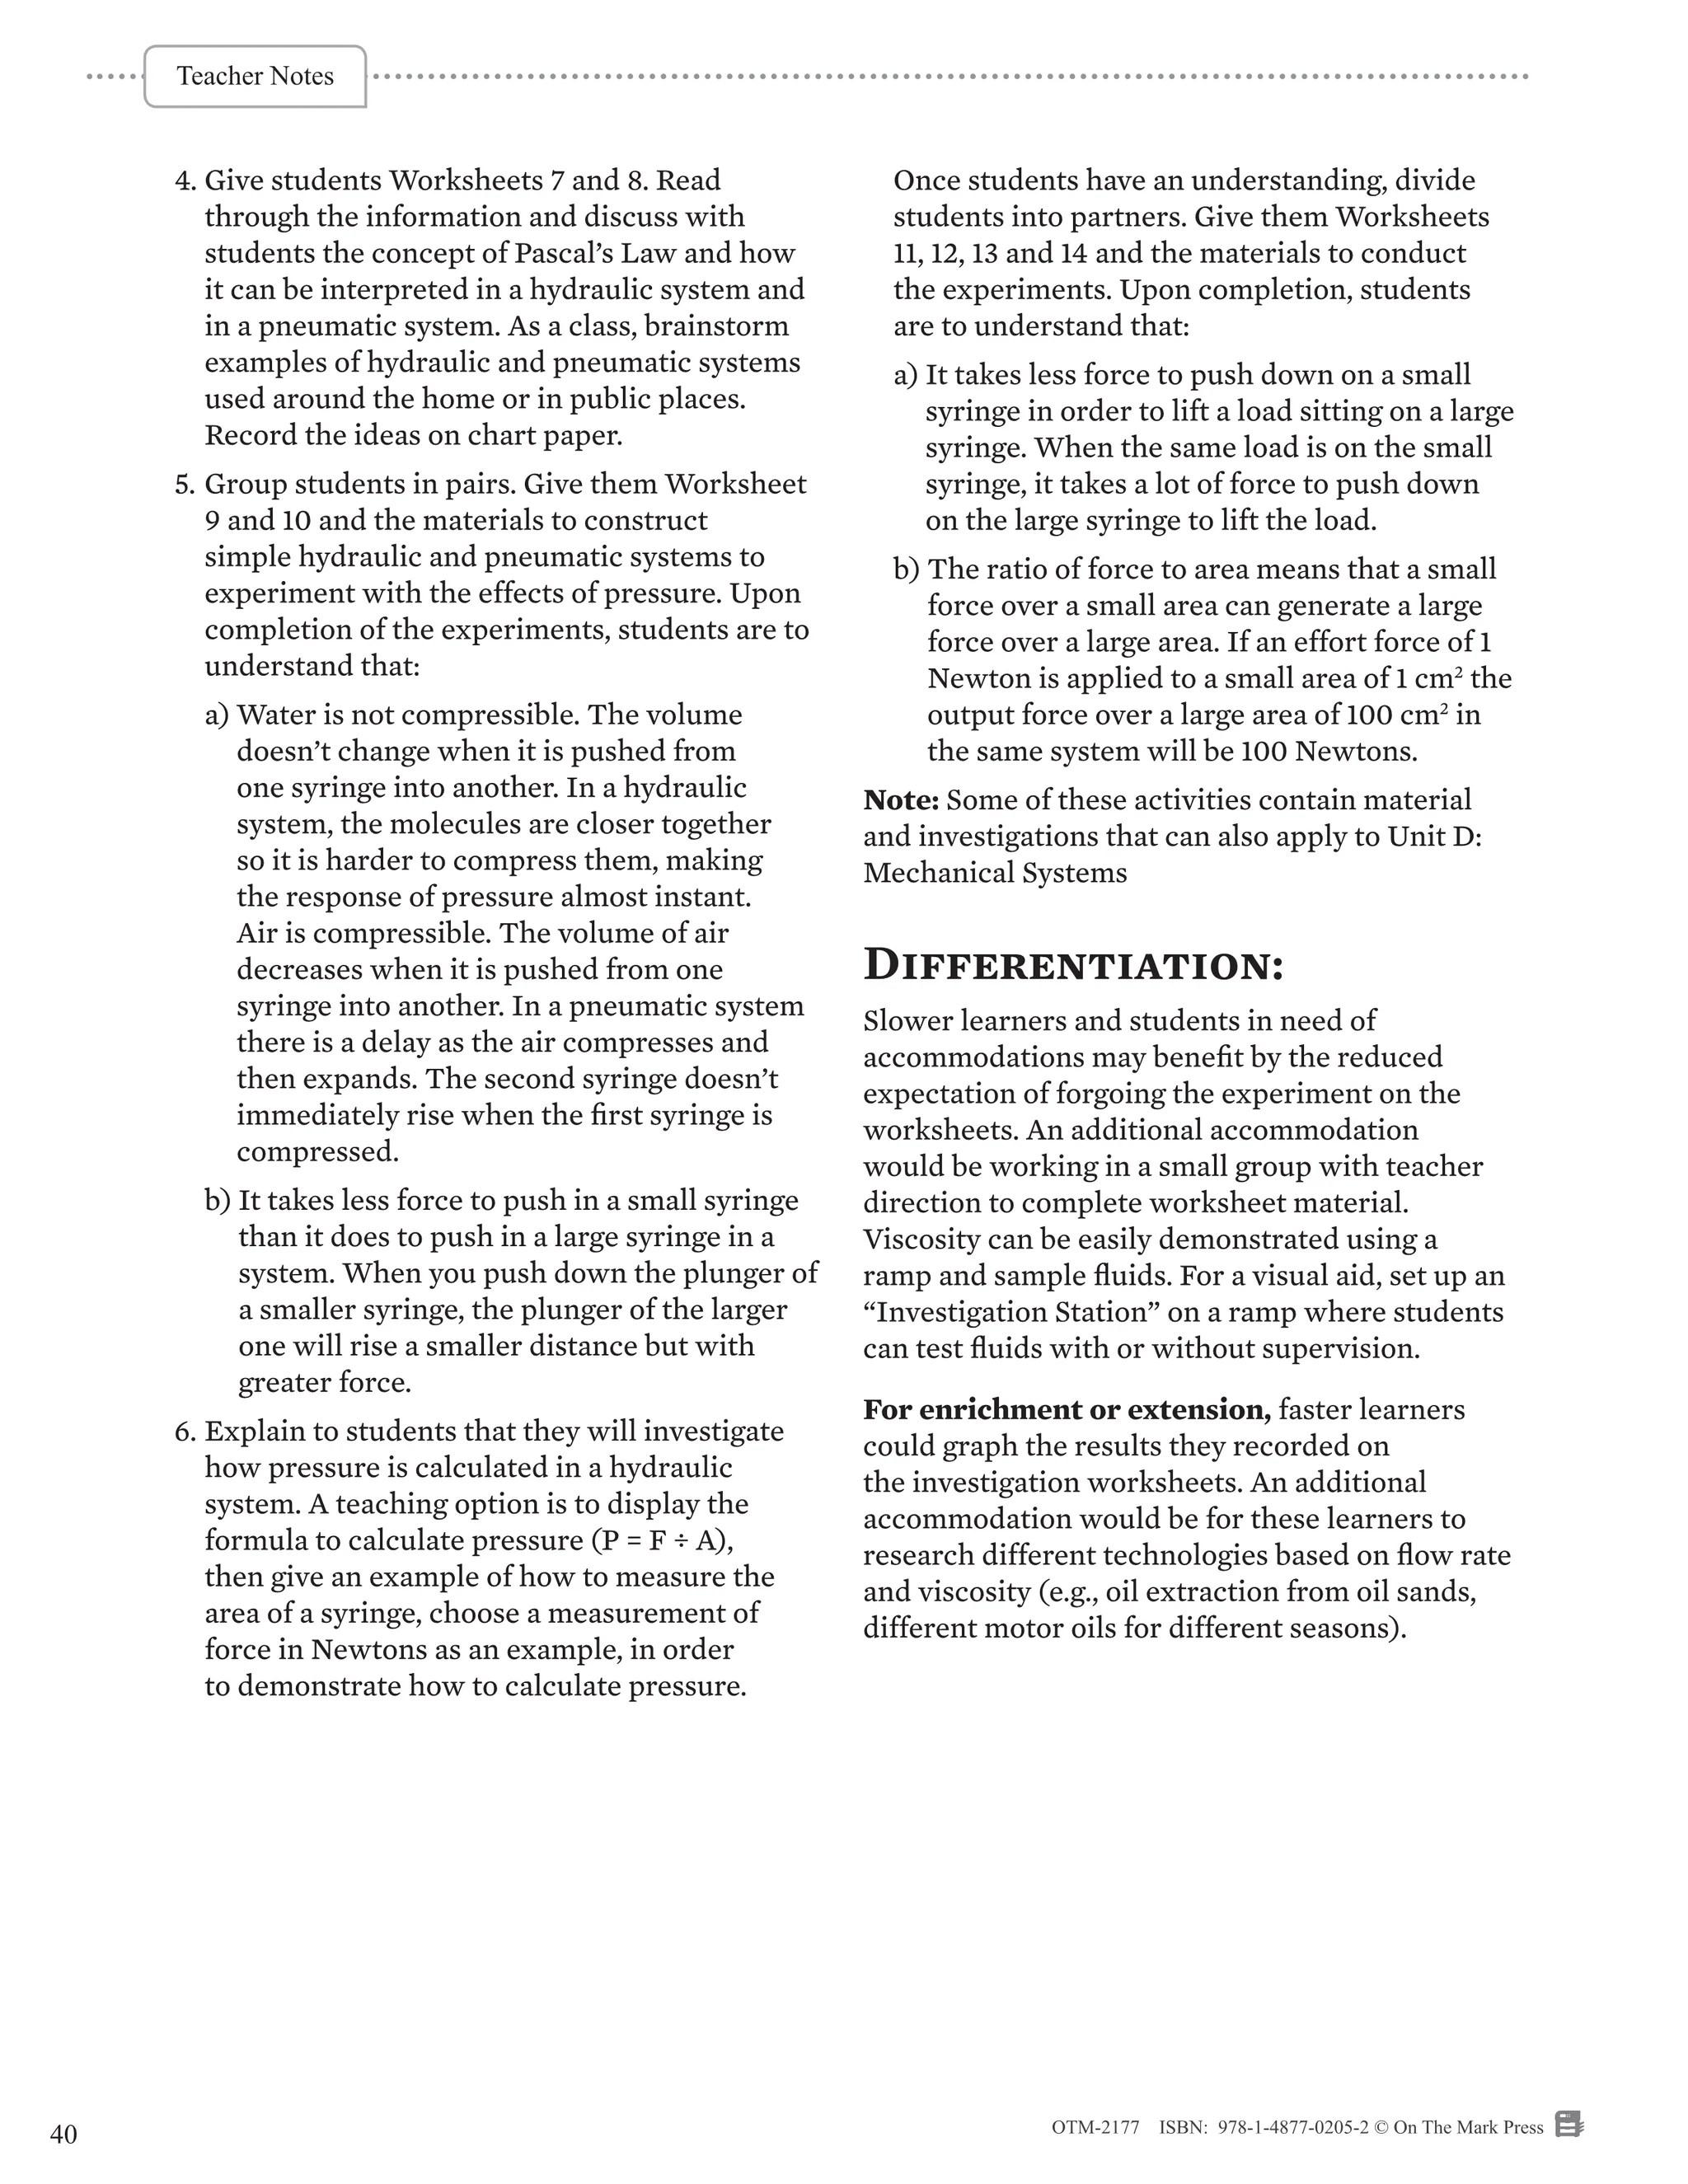 hight resolution of Alberta Grade 8 Science Curriculum - On The Mark Press